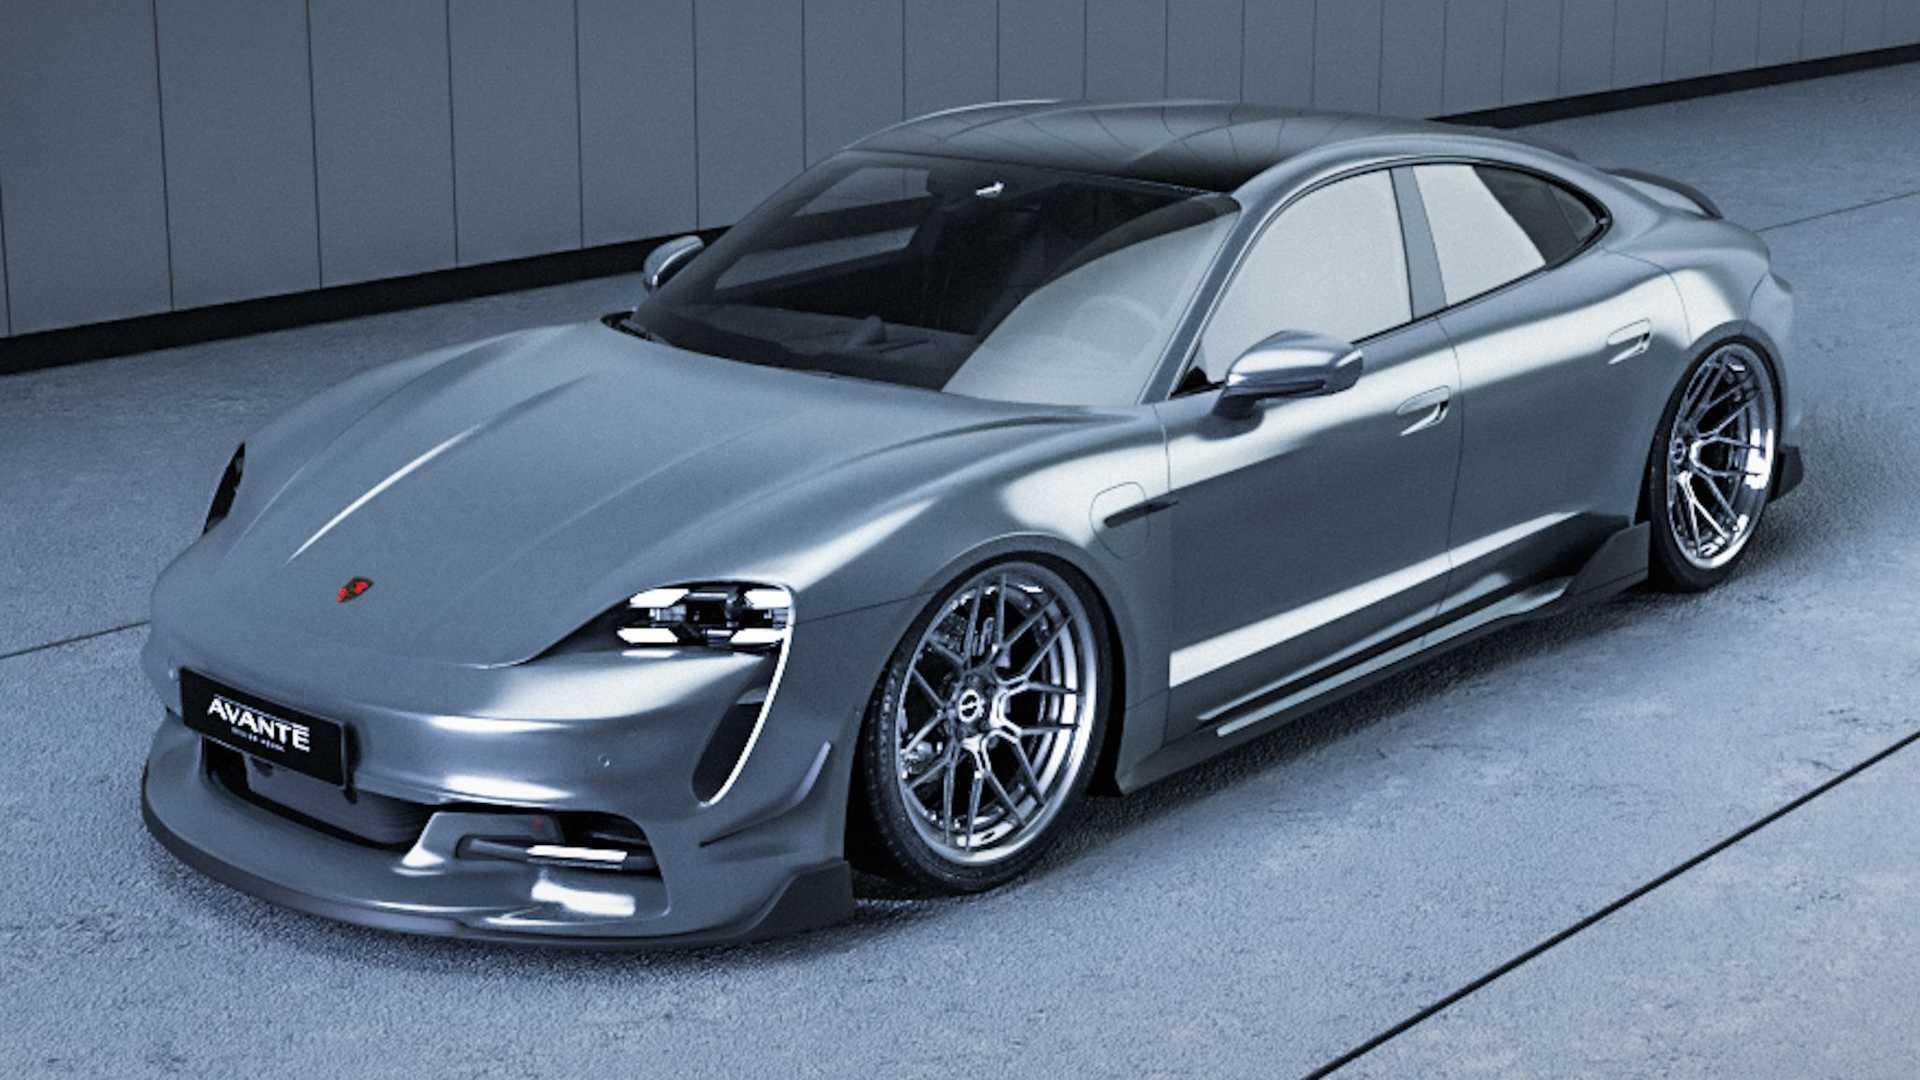 Porsche-Taycan-by-Avante-Design-11